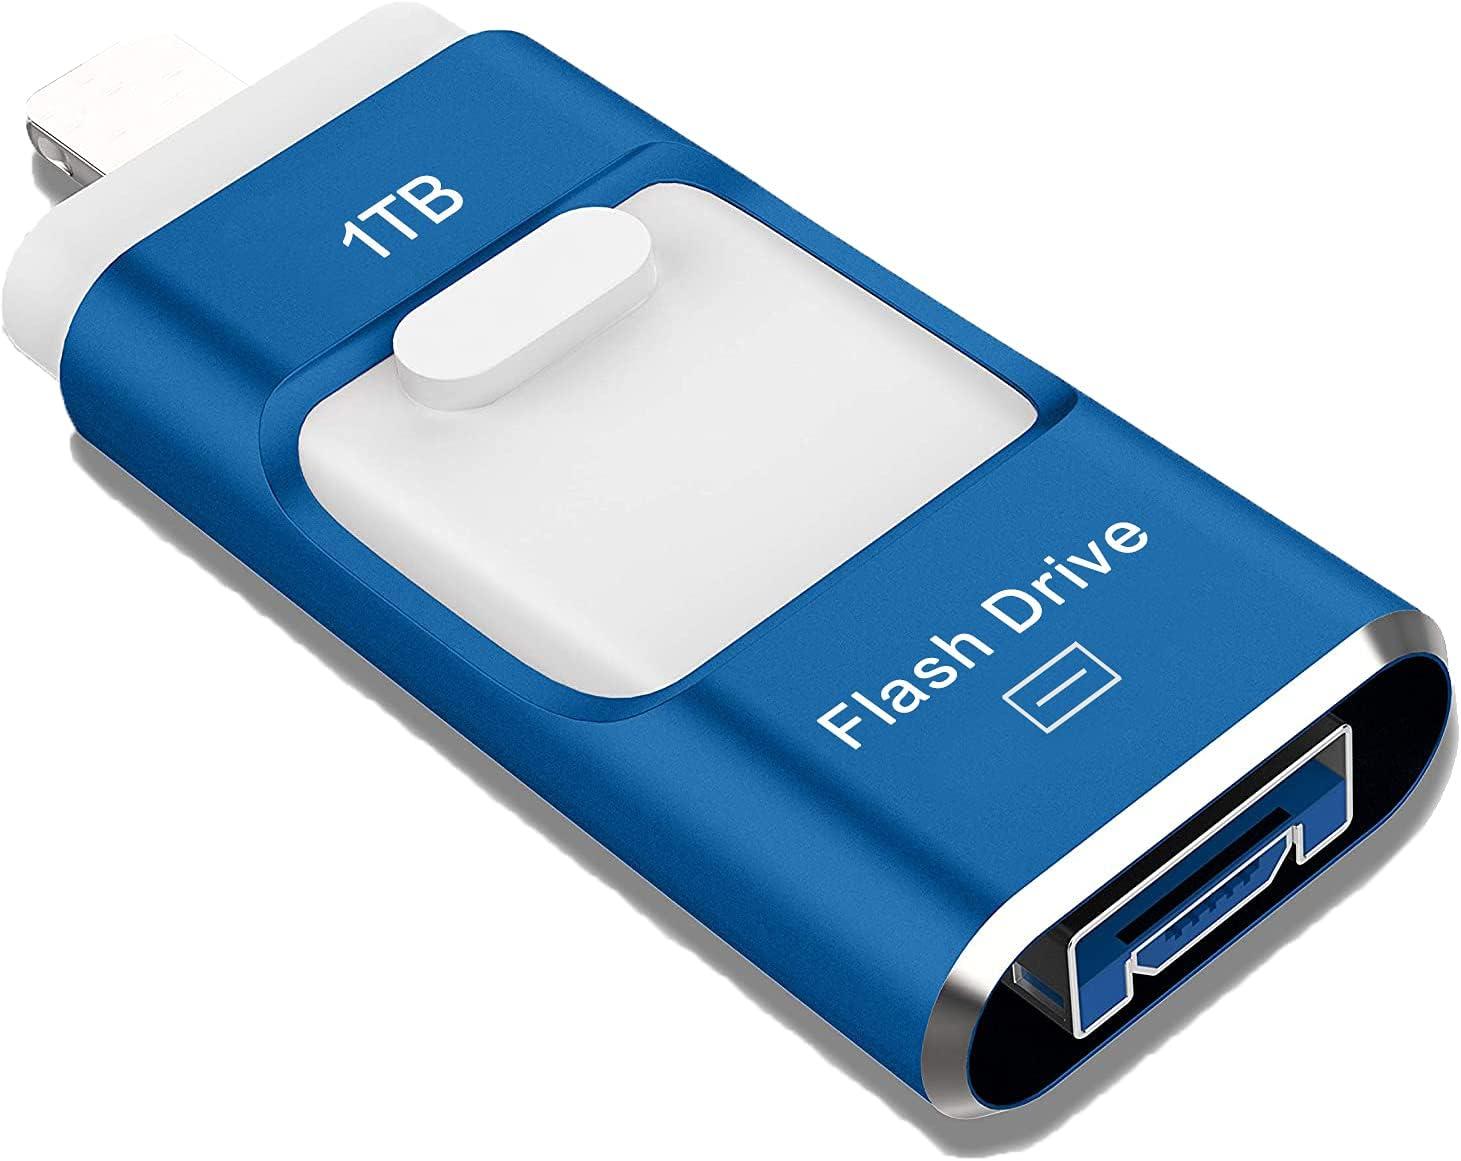 USB Flash Drive 1TB, Sttarluk Photo Stick USB 3.0 Pen Drive for iPhone/iPad External Storage Memory Stick Compatible with iPad/iPod/Mac/Android/PC (1TB Blue)